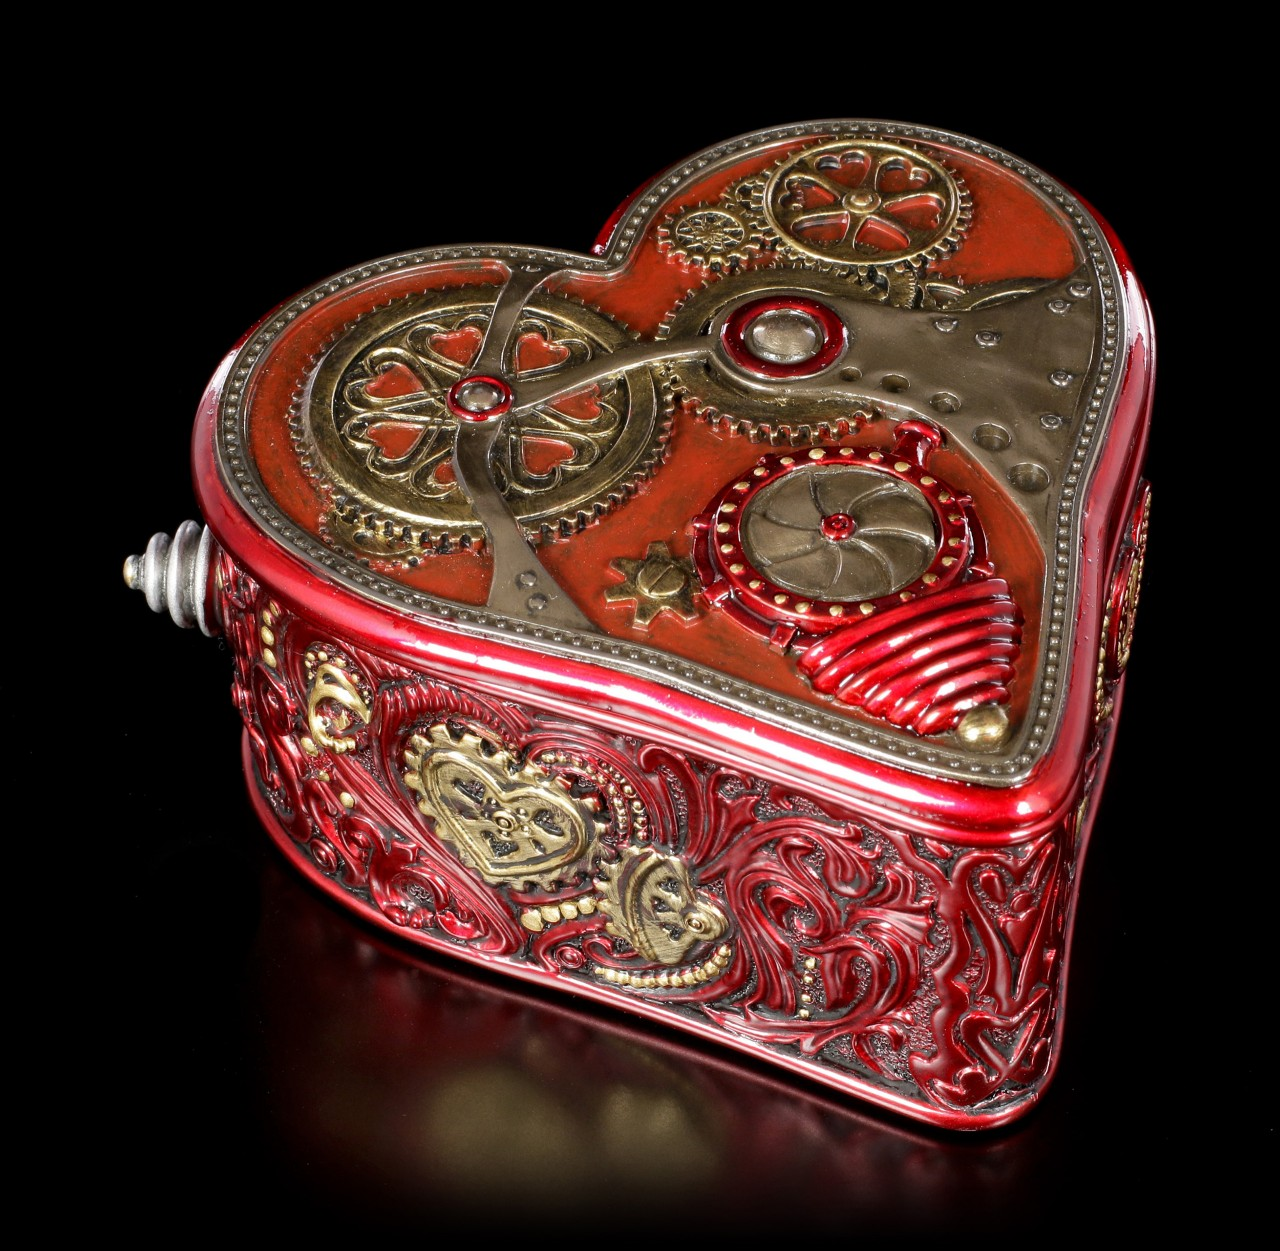 Steampunk Schatulle - Heart by Myles Pinkney